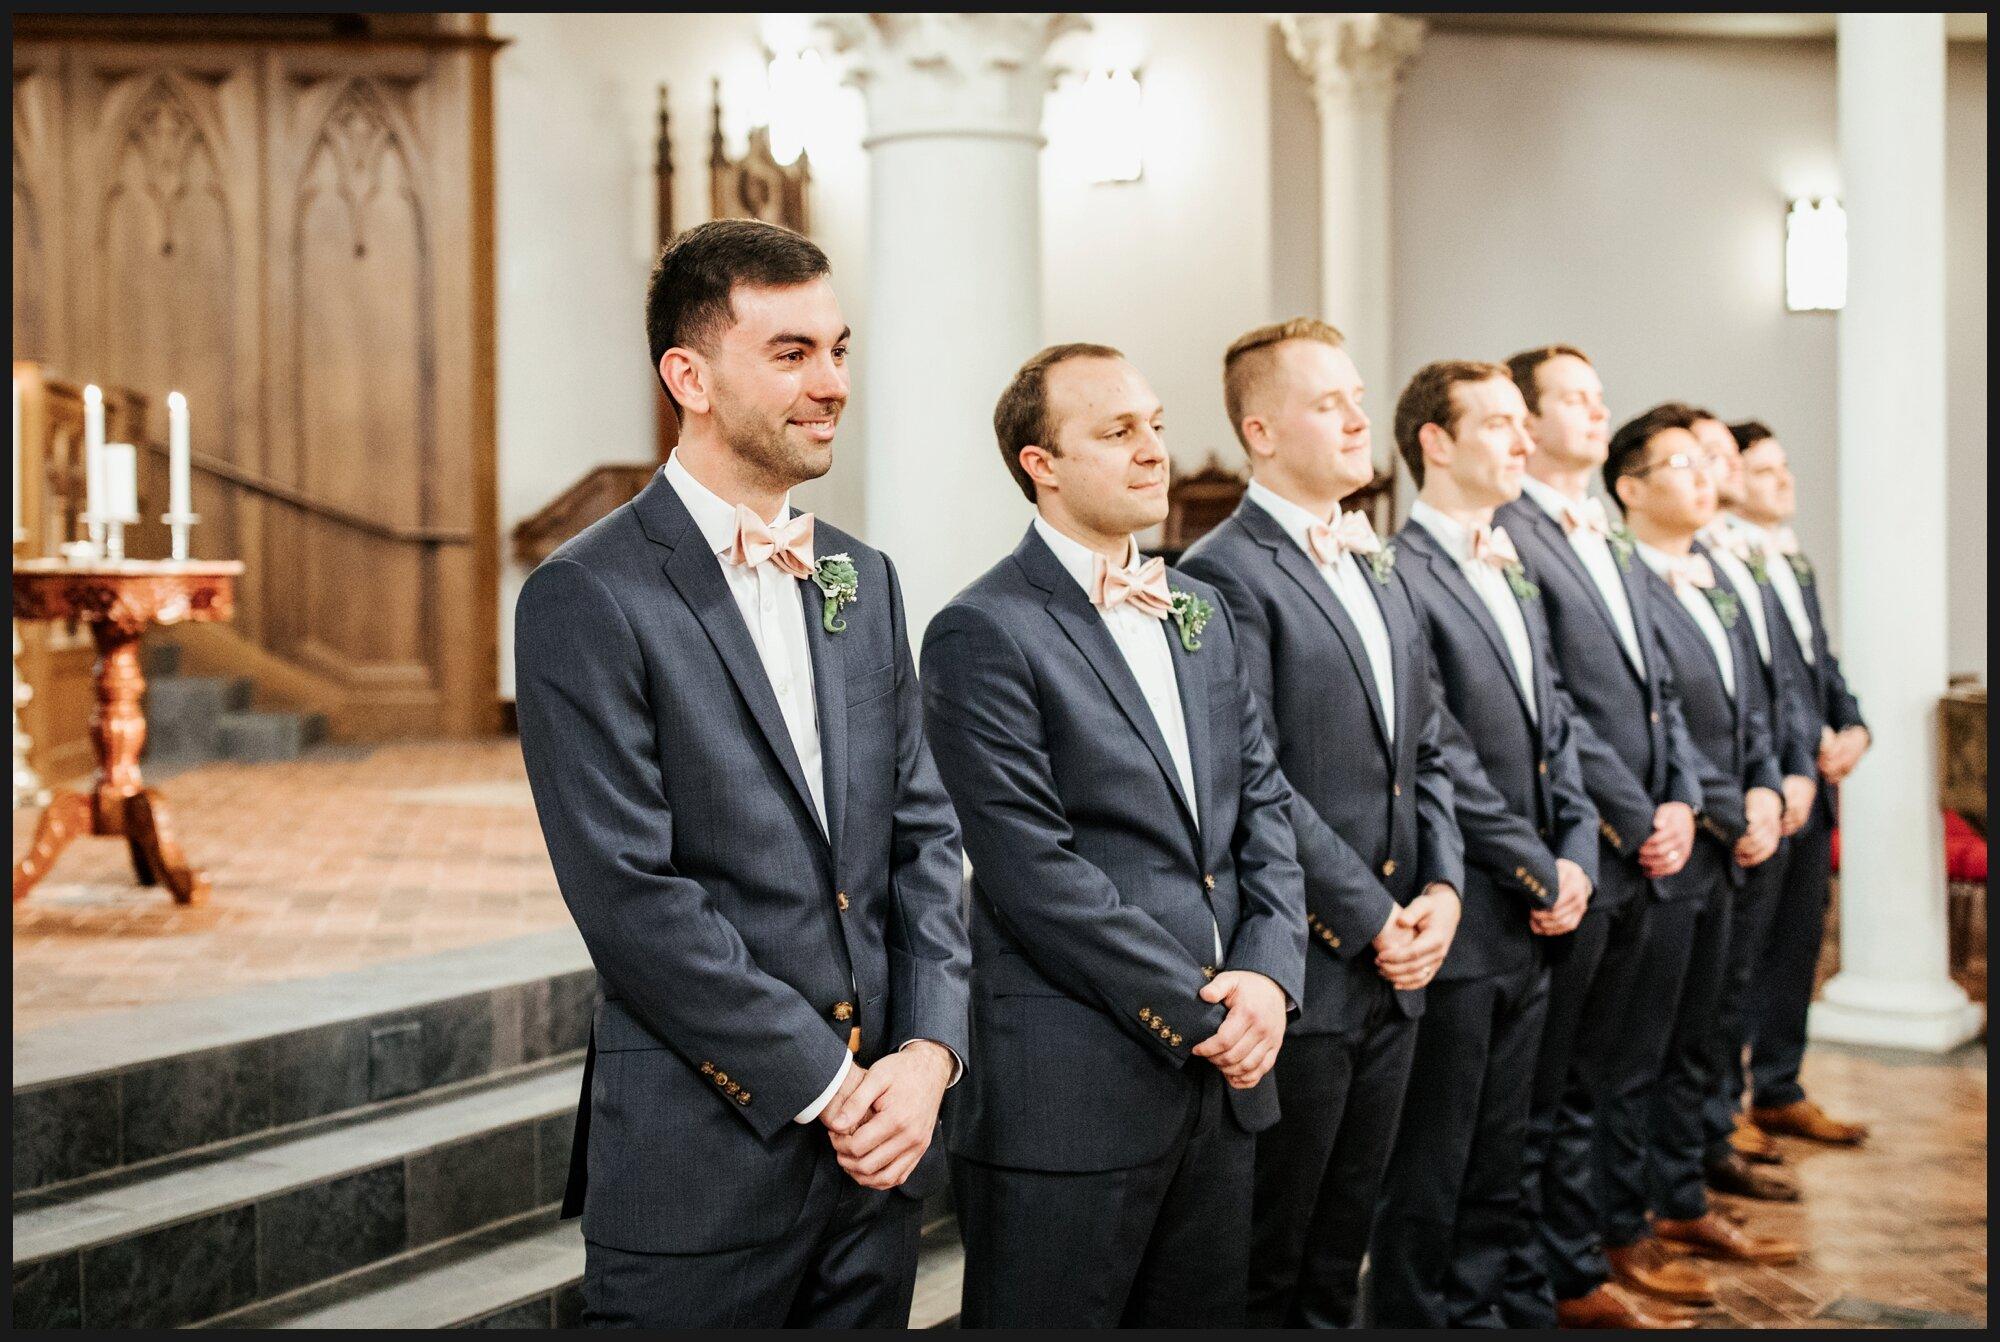 Orlando-Wedding-Photographer-destination-wedding-photographer-florida-wedding-photographer-hawaii-wedding-photographer_0679.jpg